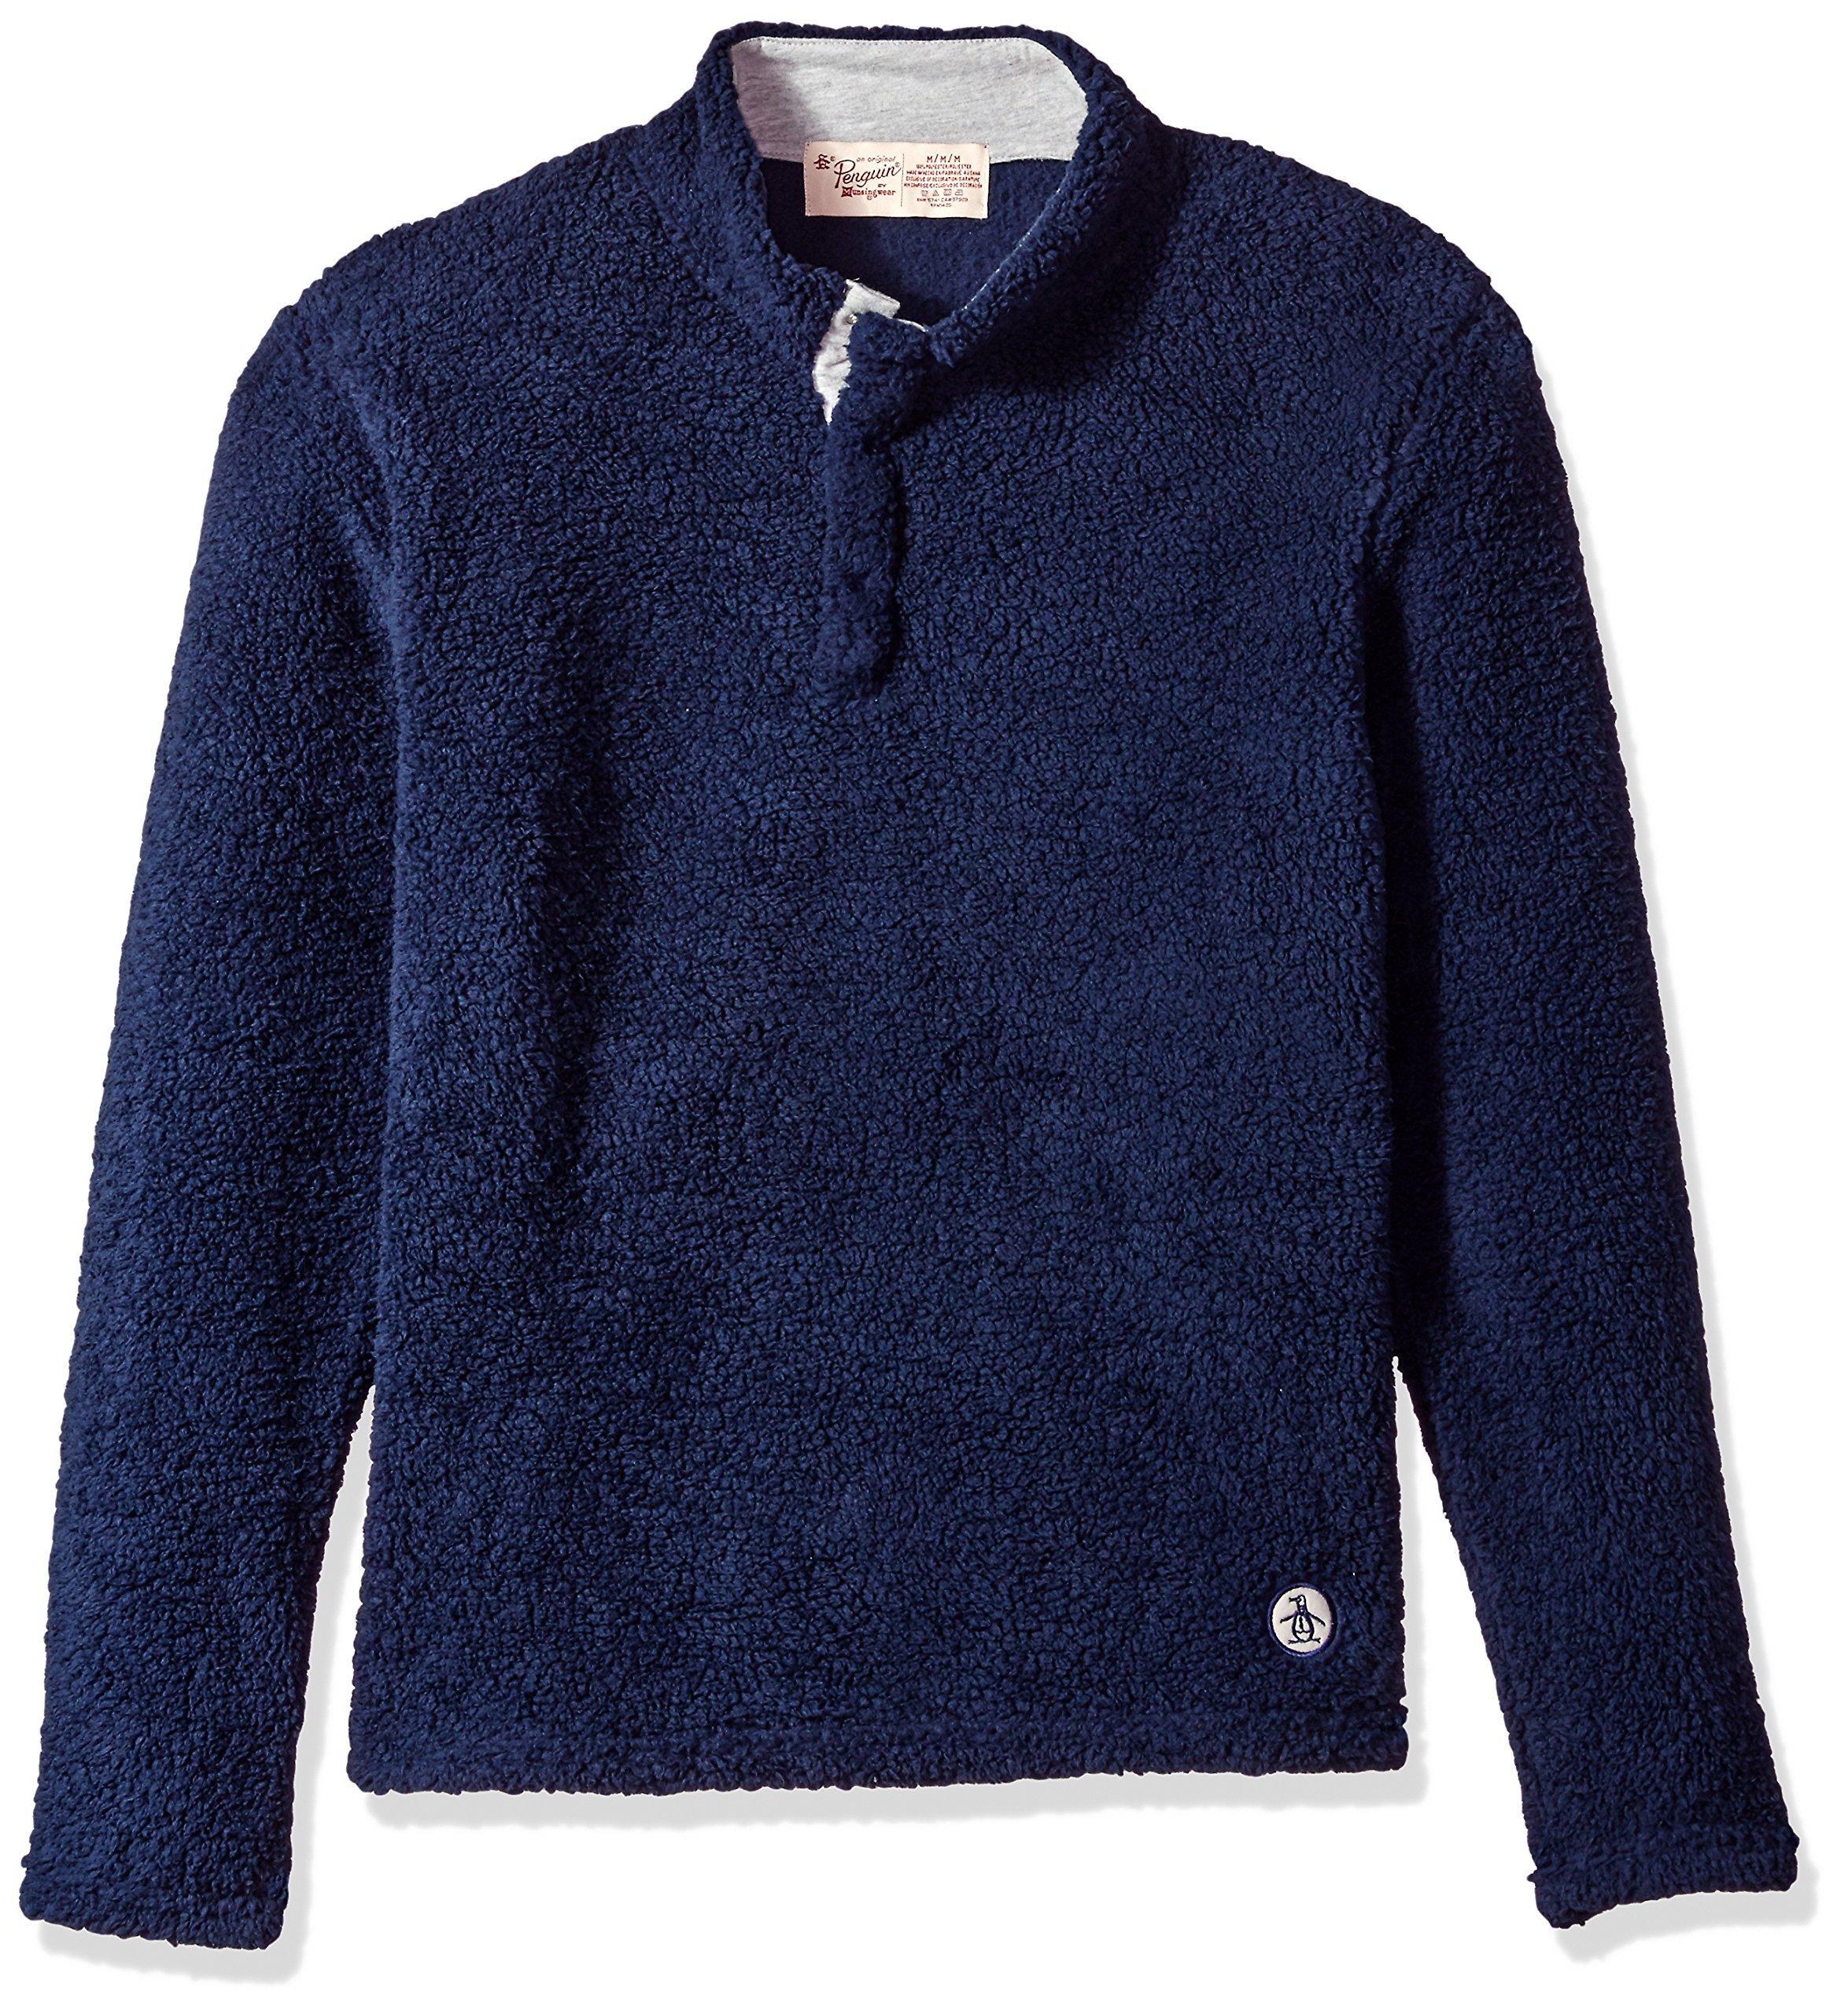 Original Penguin Men's Fleece Mock Neck Top, Medieval Blue, M